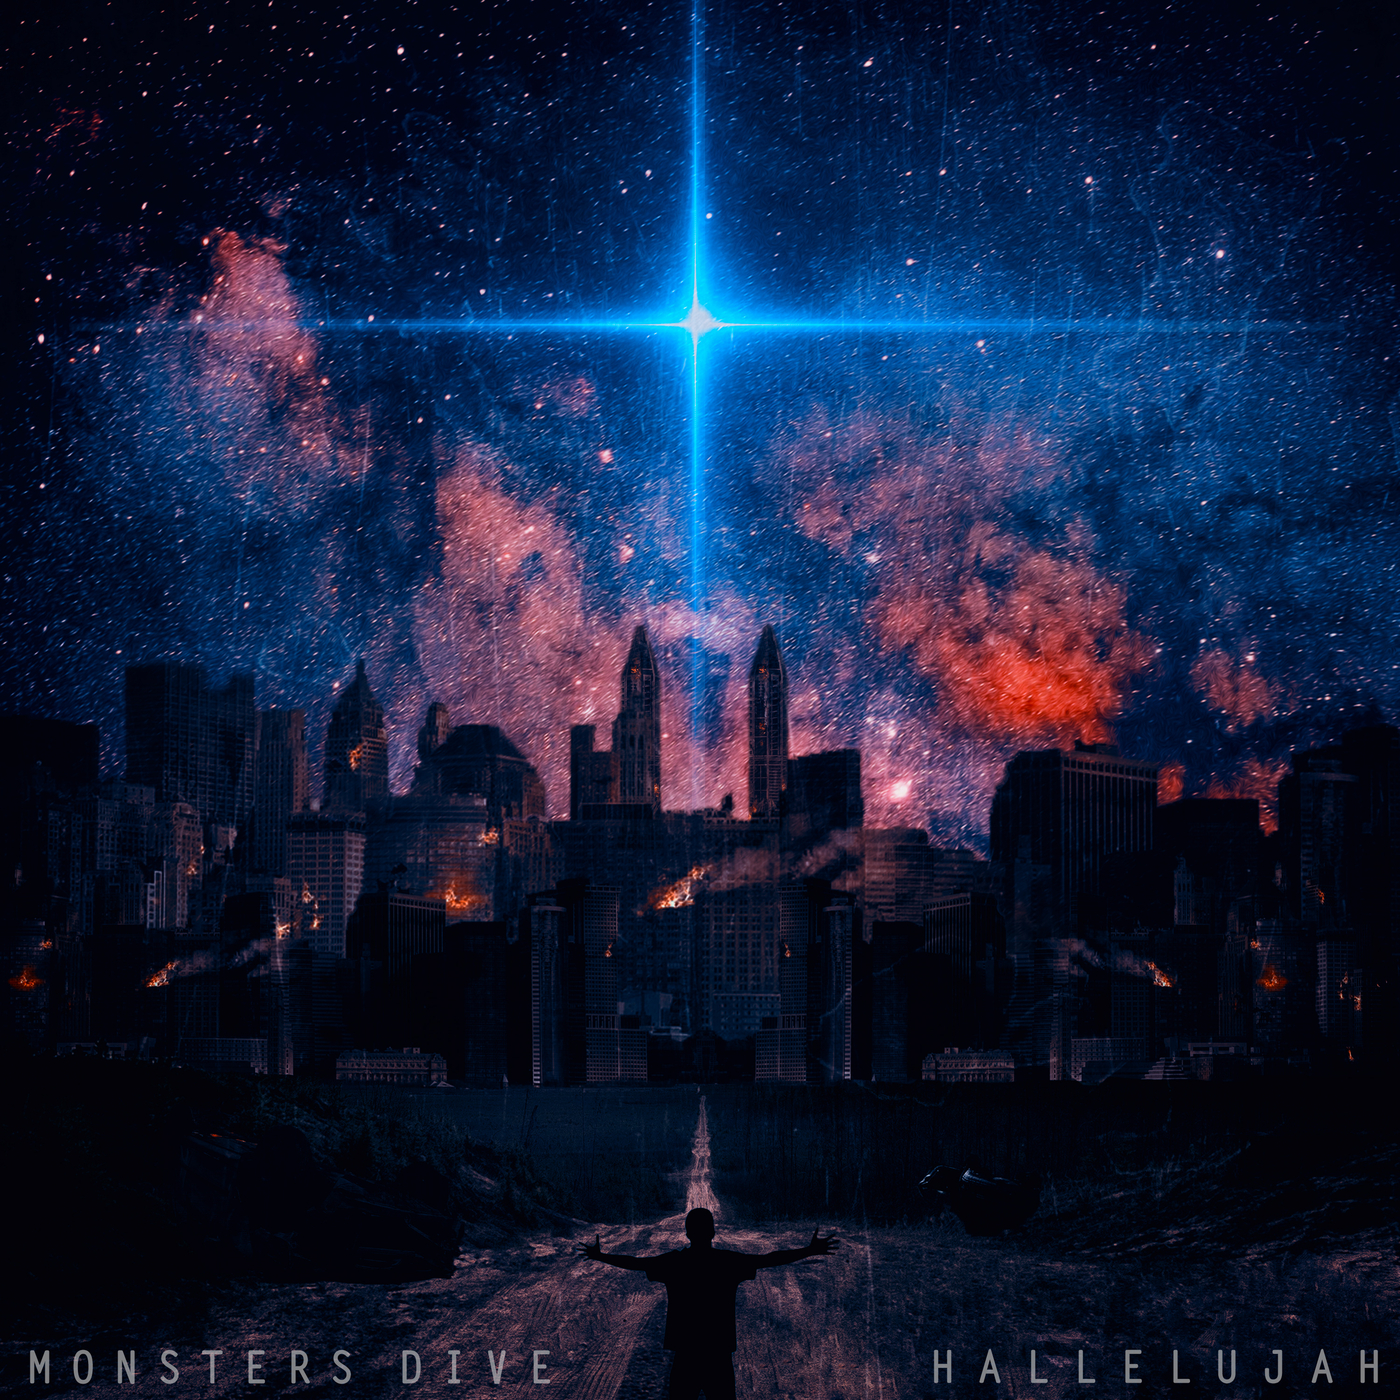 Monsters Dive - Hallelujah [single] (2018)